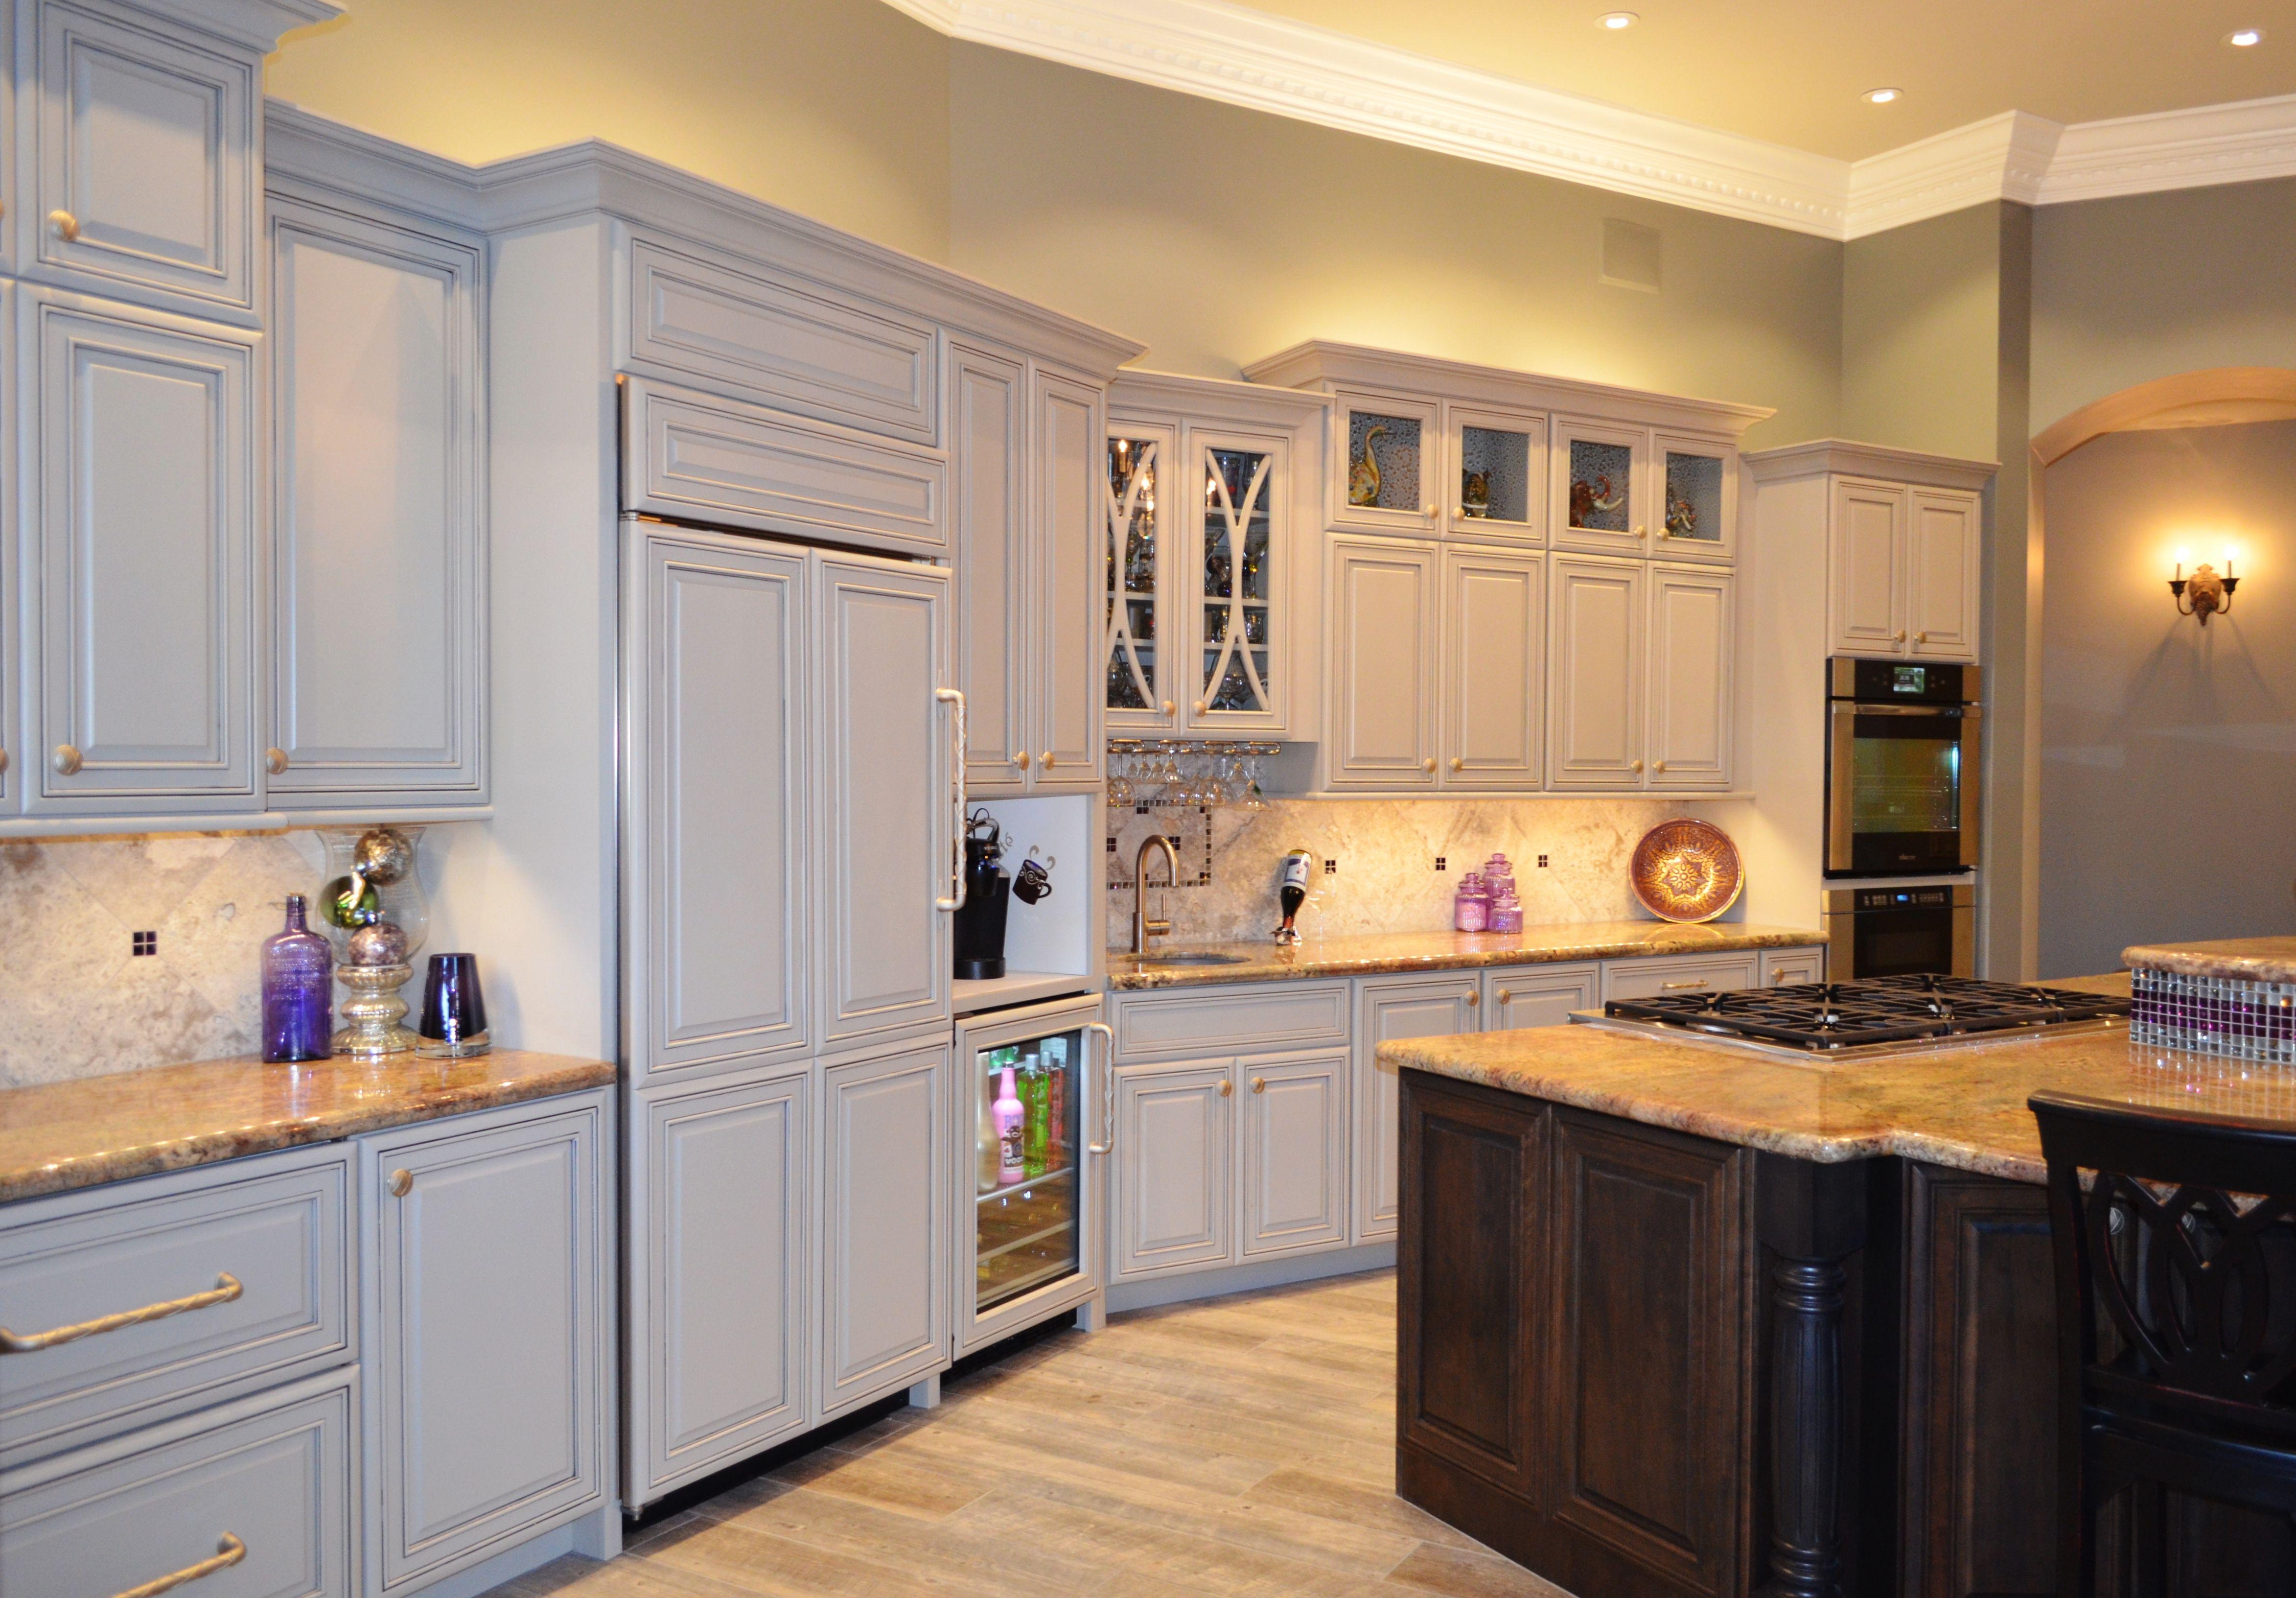 Pin by Homework Remodels on Elegant Transitional | Kitchen ...